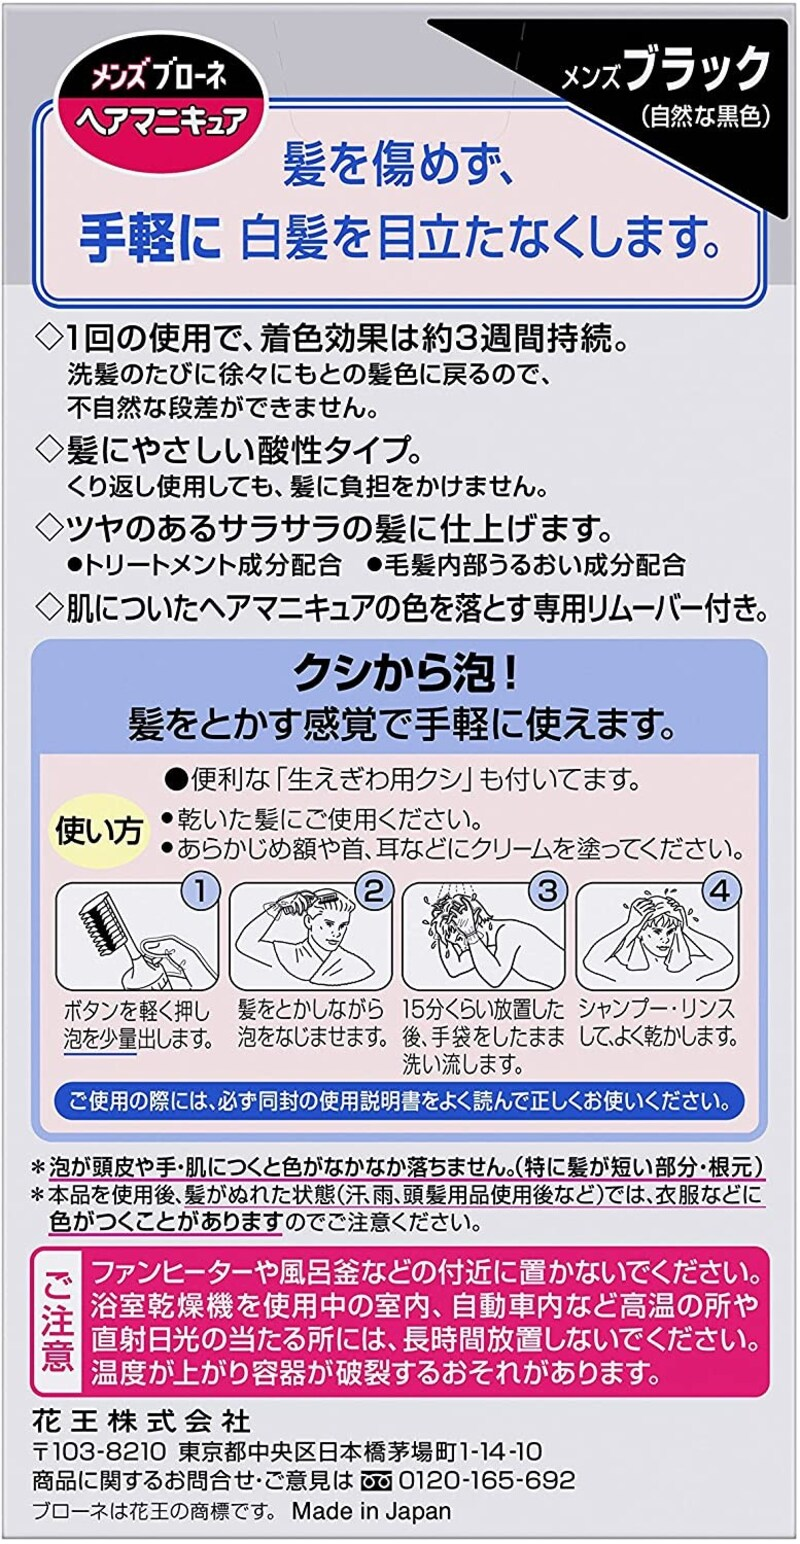 Kao(花王),メンズブローネ ヘアマニキュア